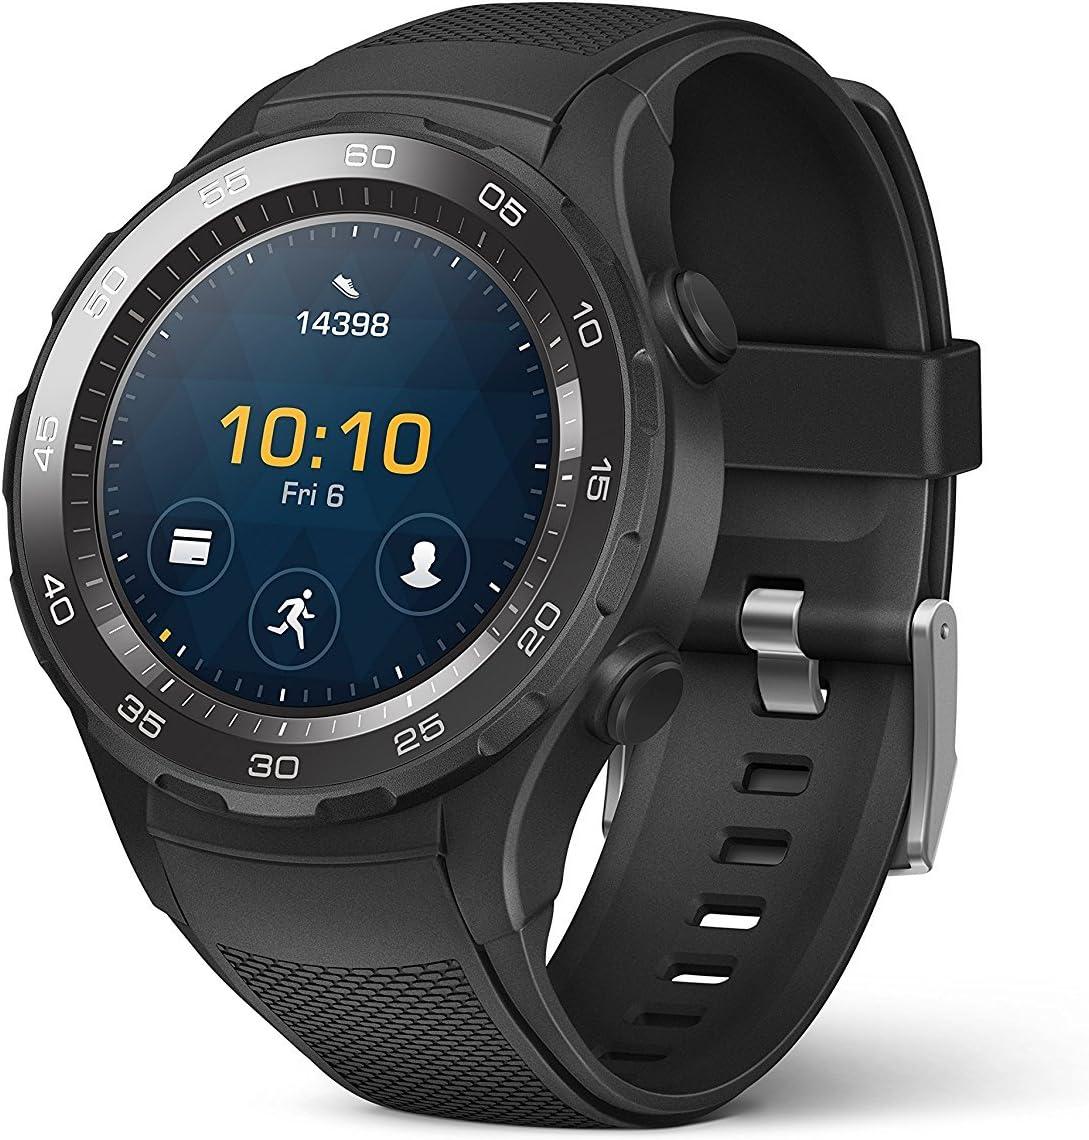 55% OFF Huawei Watch 2 Sport Smartwatch Trust - Black Ceramic Bezel Carbon S